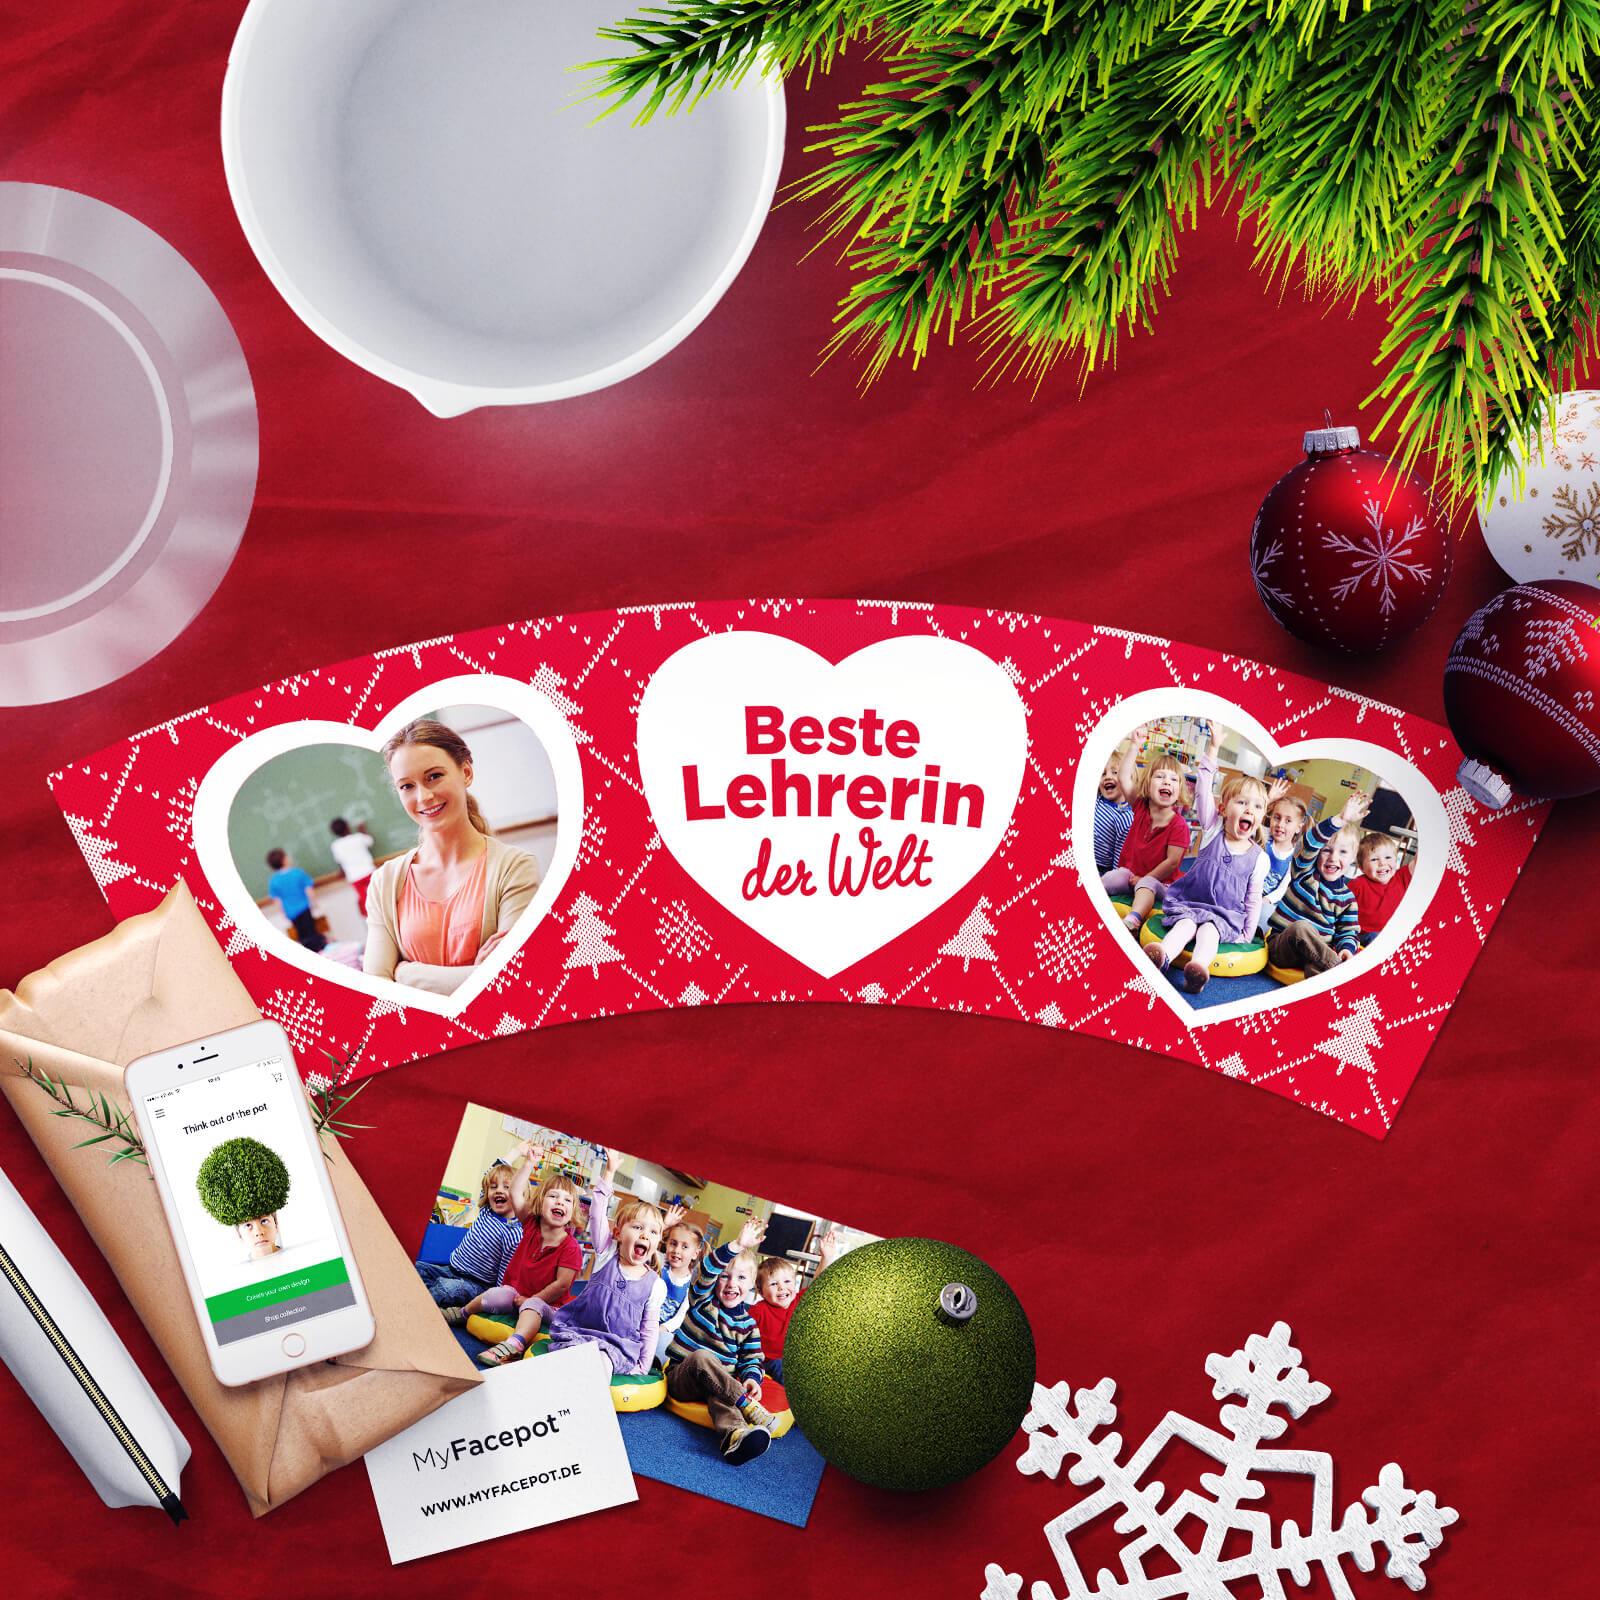 Beste Lehrerin – Geschenk Weihnachten – MyFacepot.de